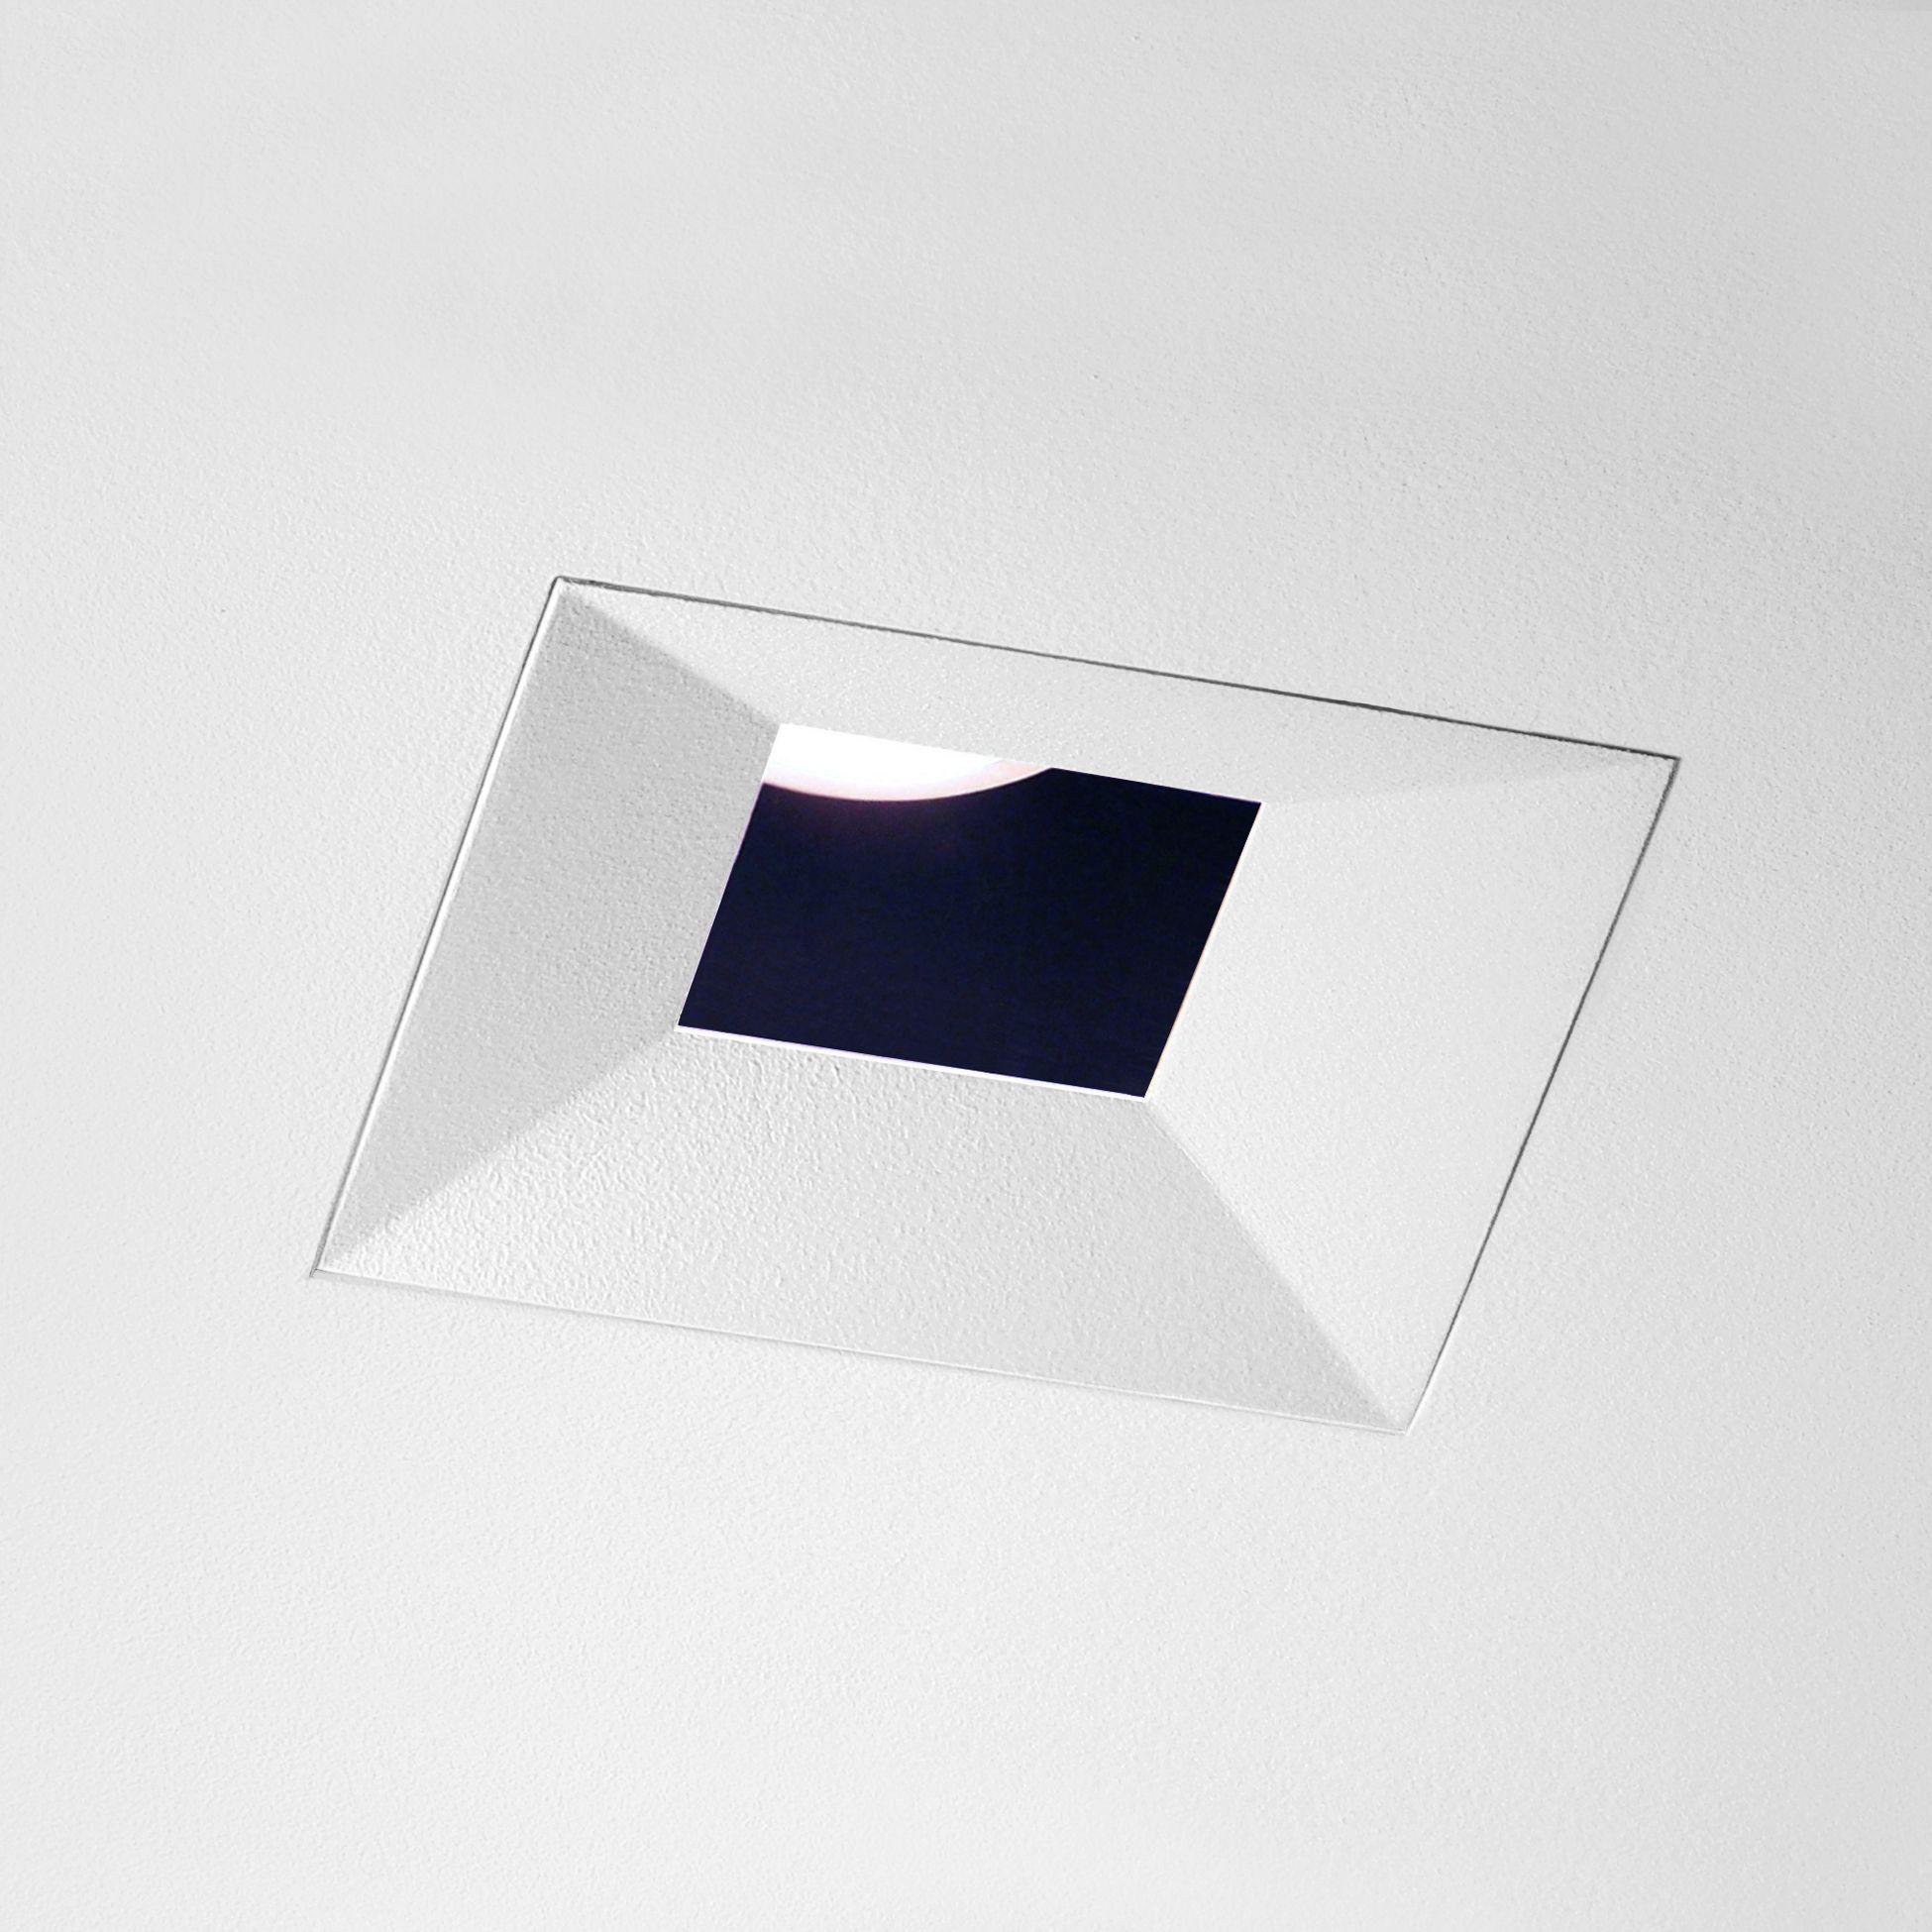 No 8 Lighting Adjustable Downlight Square Lamp Downlights Recessed Lighting